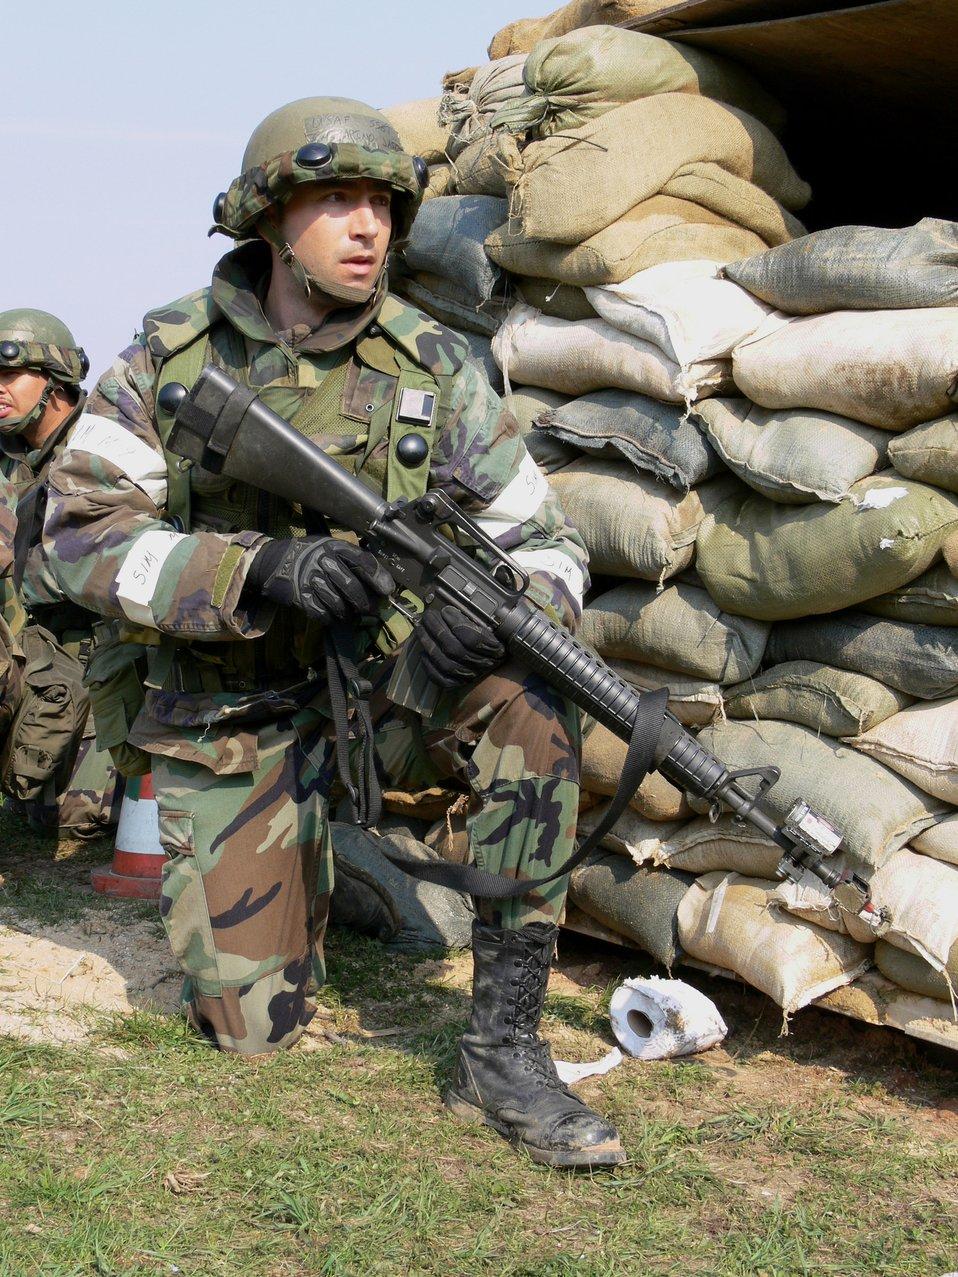 Combat comm Airmen hone skills in field training